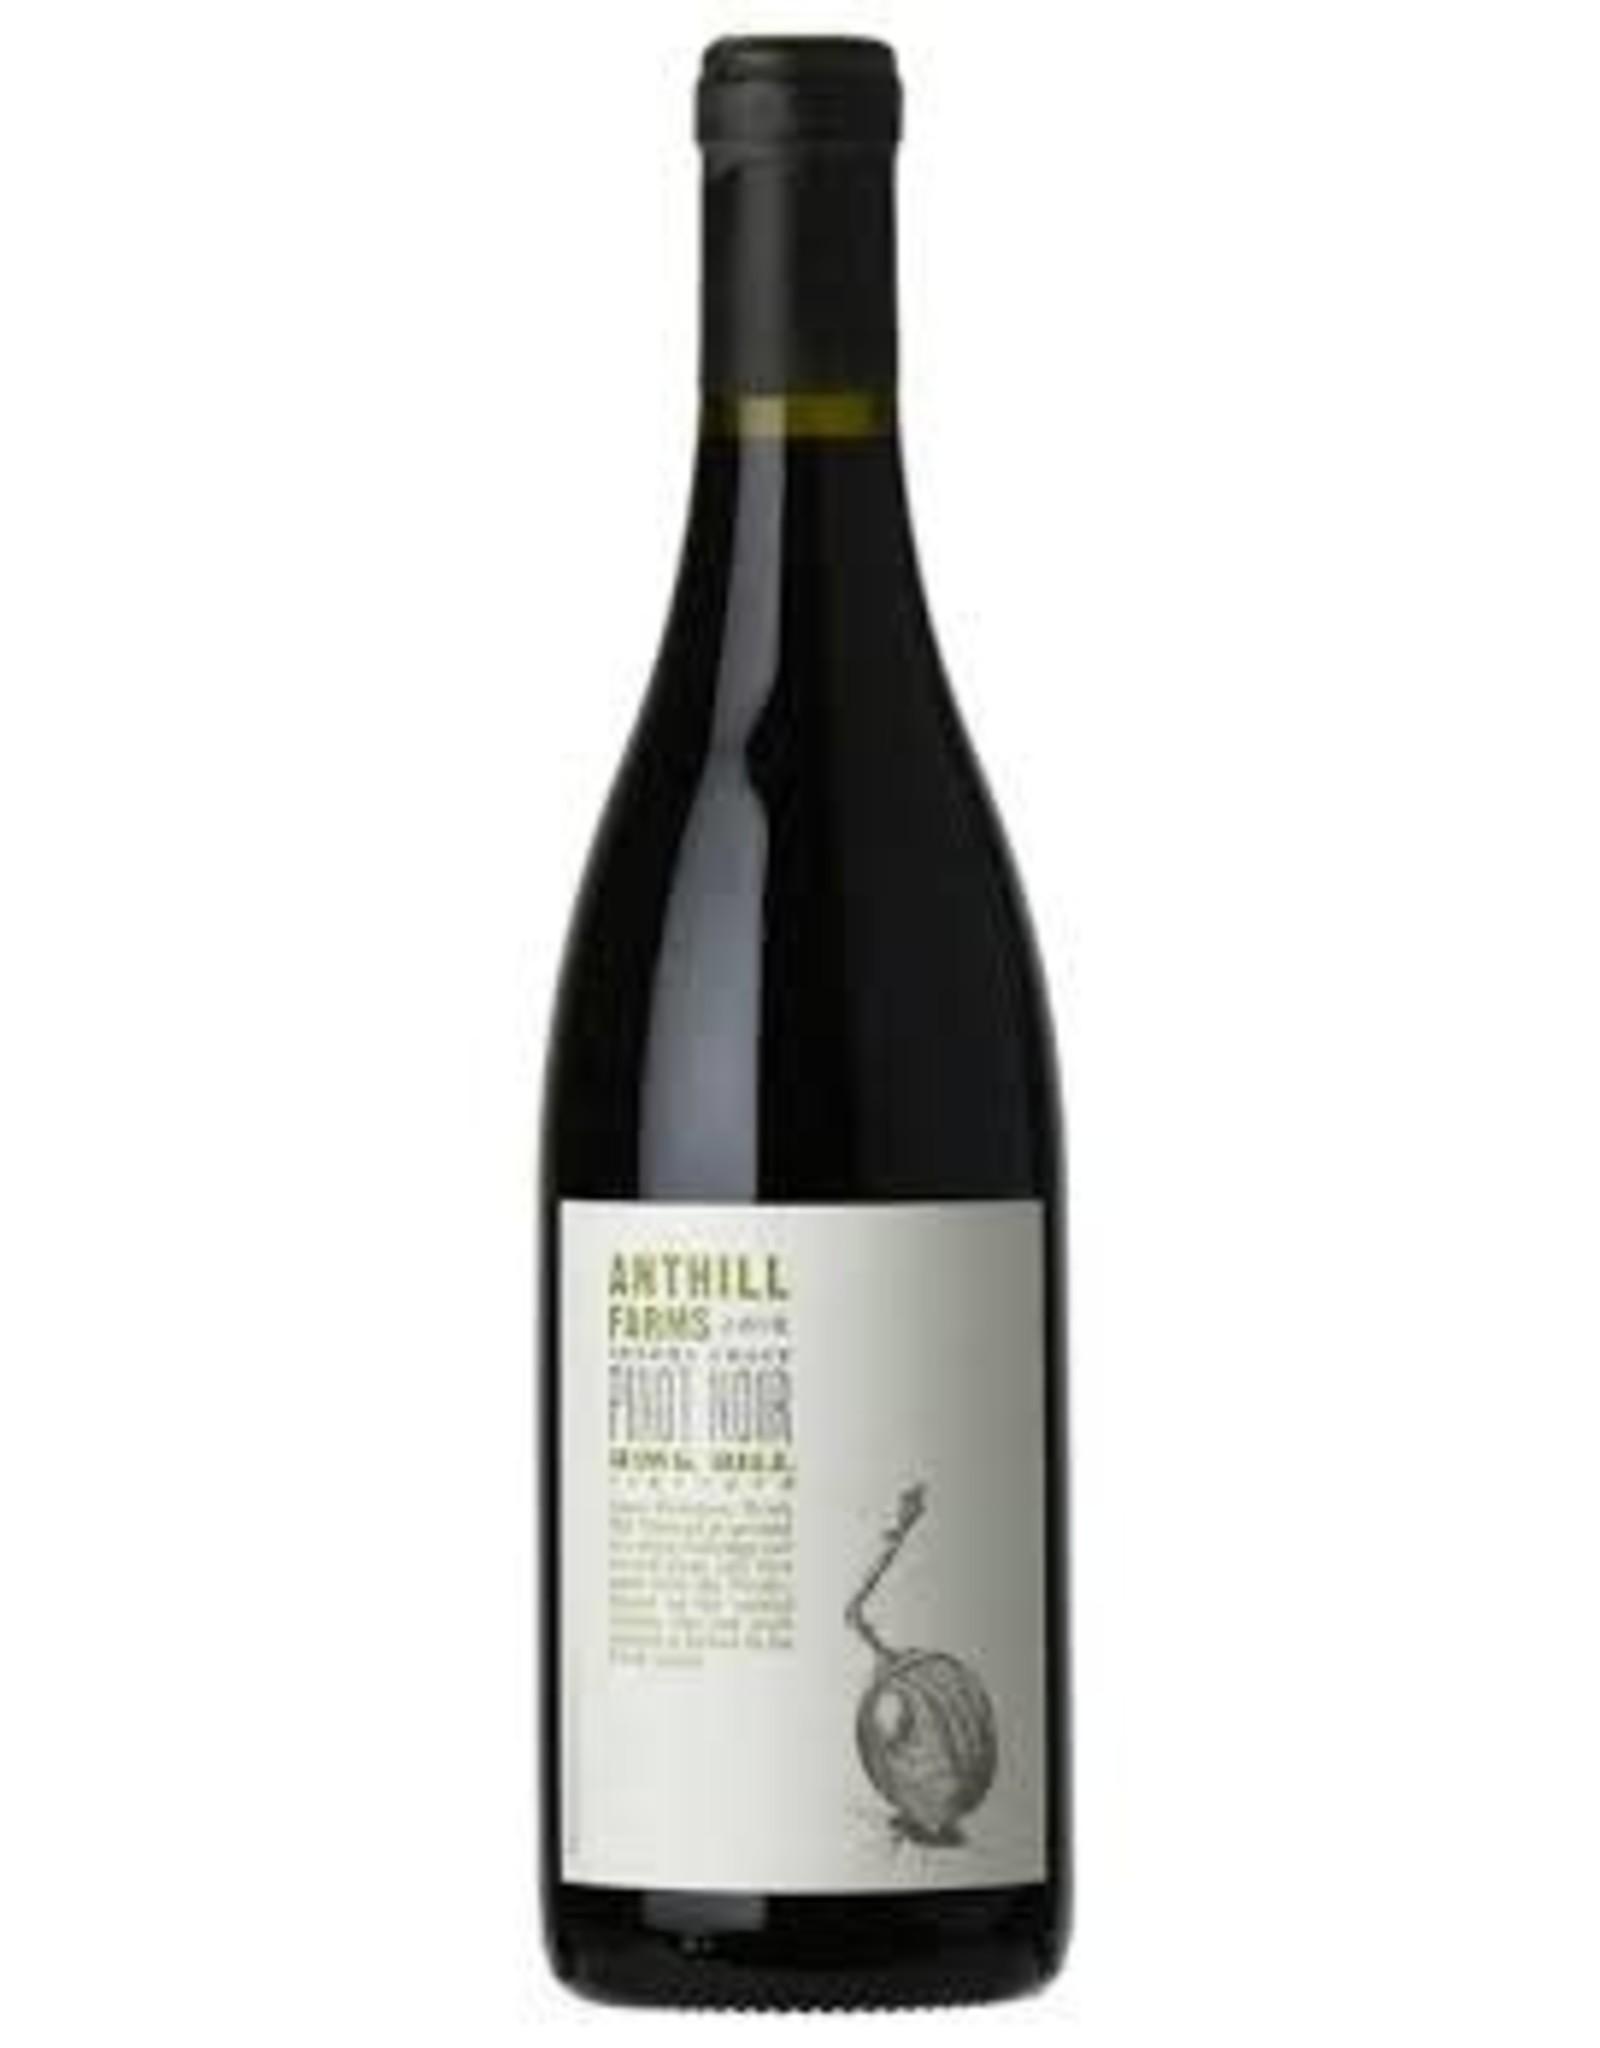 Anthill Farms Anthill Farms Pinot Noir, Hawk Hill Vineyard, Sonoma Coast 2019